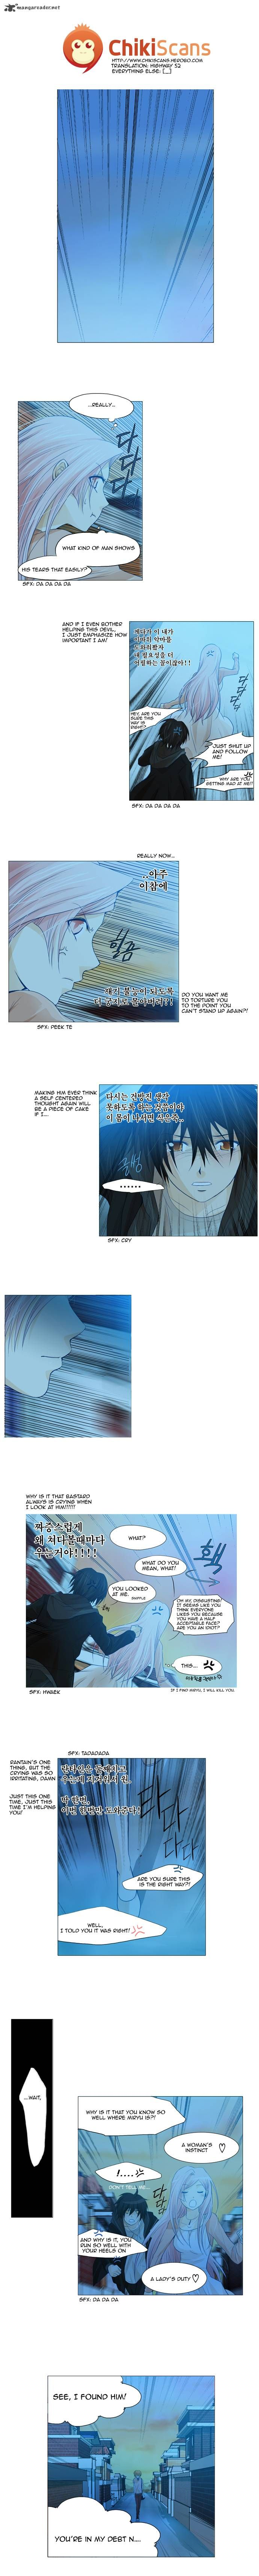 under PRIN 58 Page 1